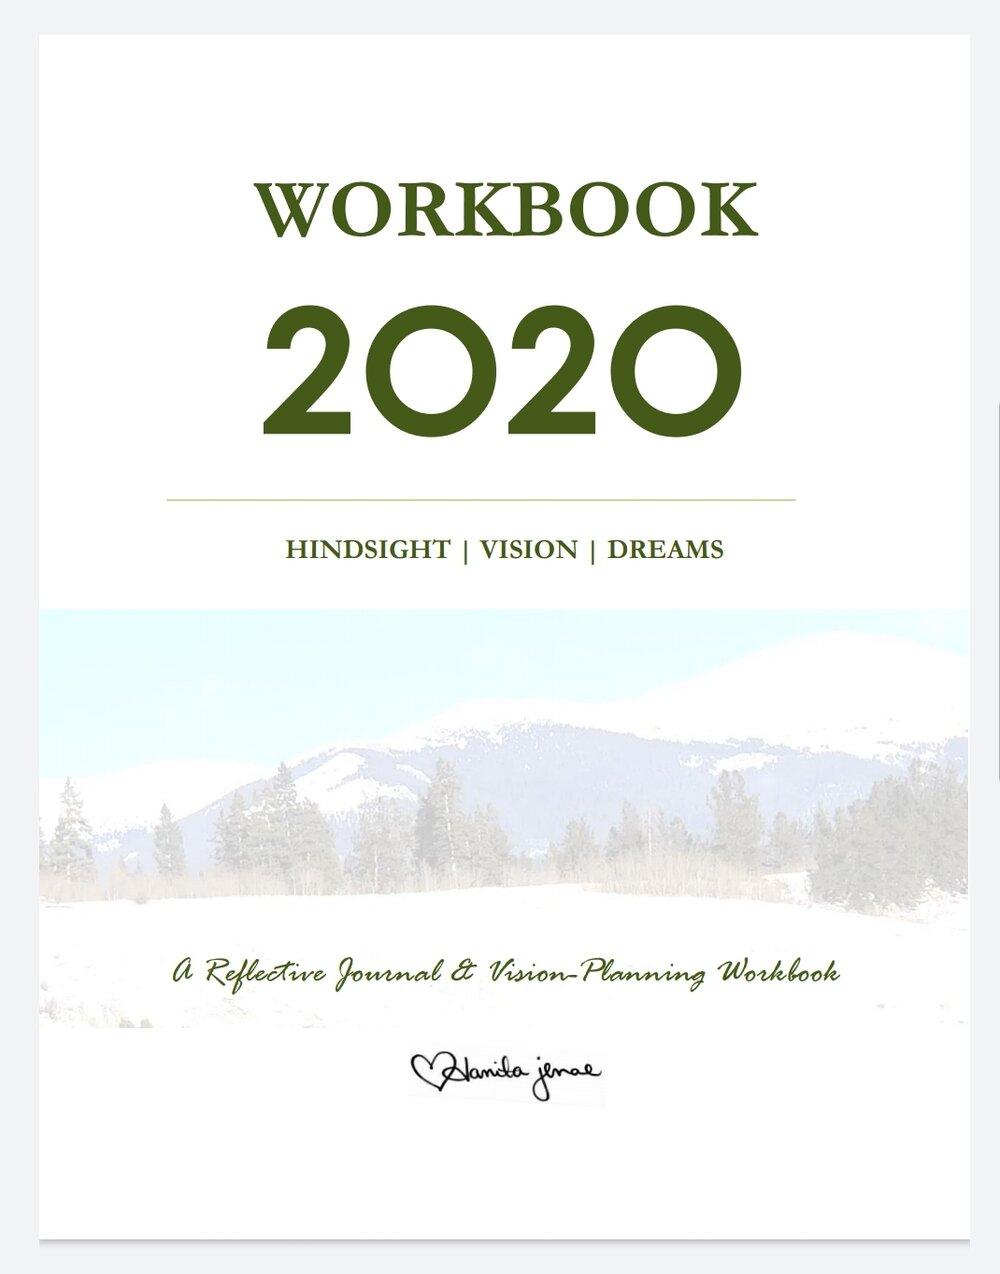 Workbook 2020 Cover 2.jpg